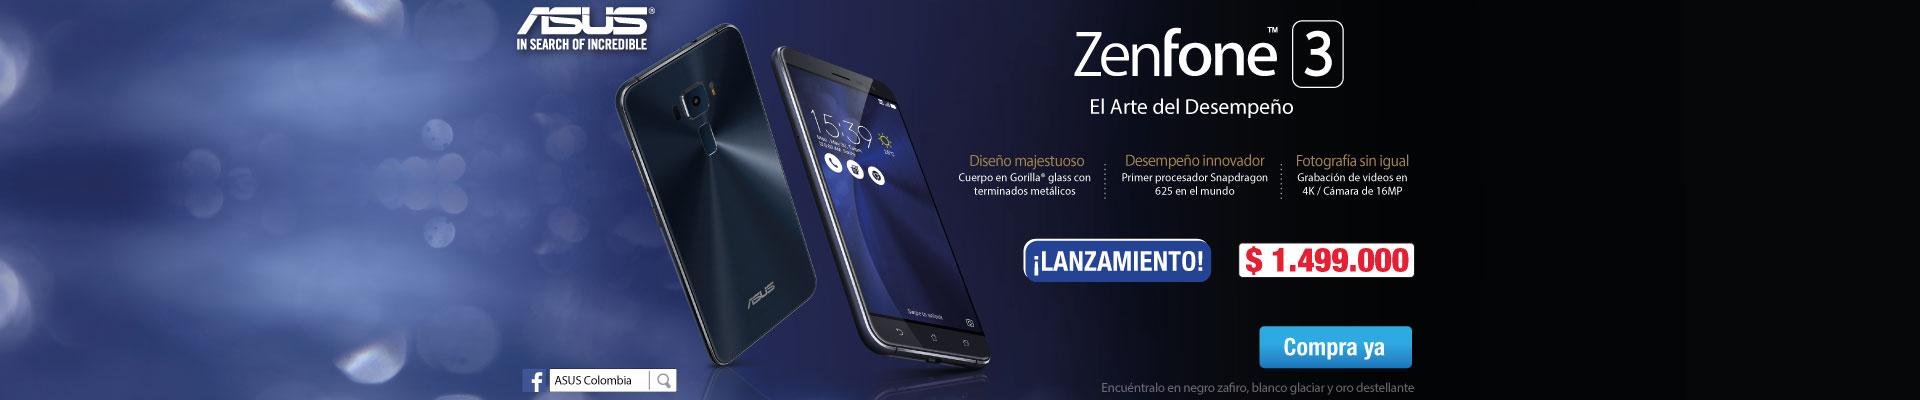 Celular Asus Zenfone 3 Ak Ppla - Pauta Novi 30